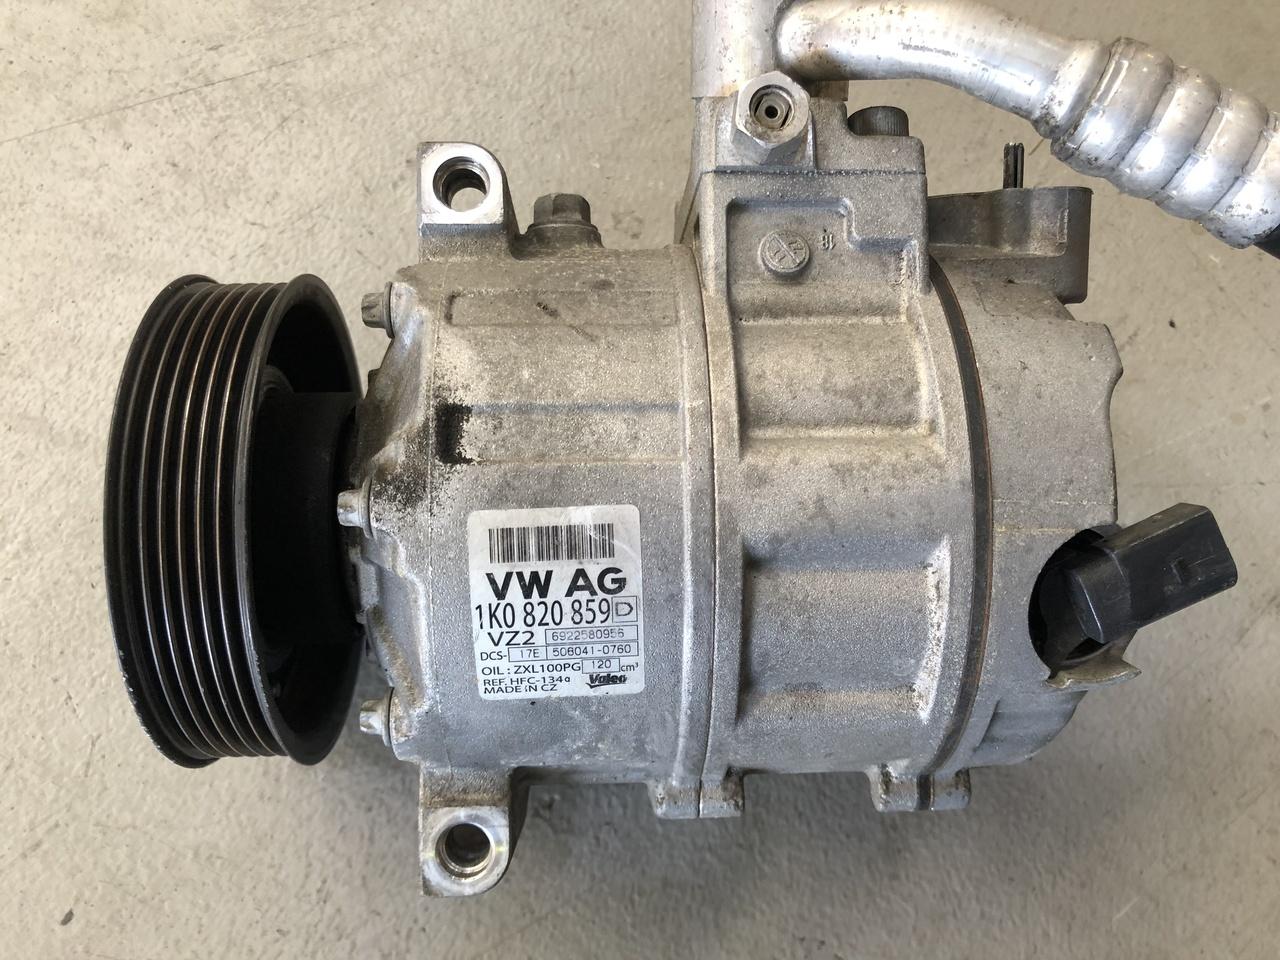 VW GOLF MK5 MK6 PETROL MODELS USED AC COMPRESSOR 1K0 820 803 D